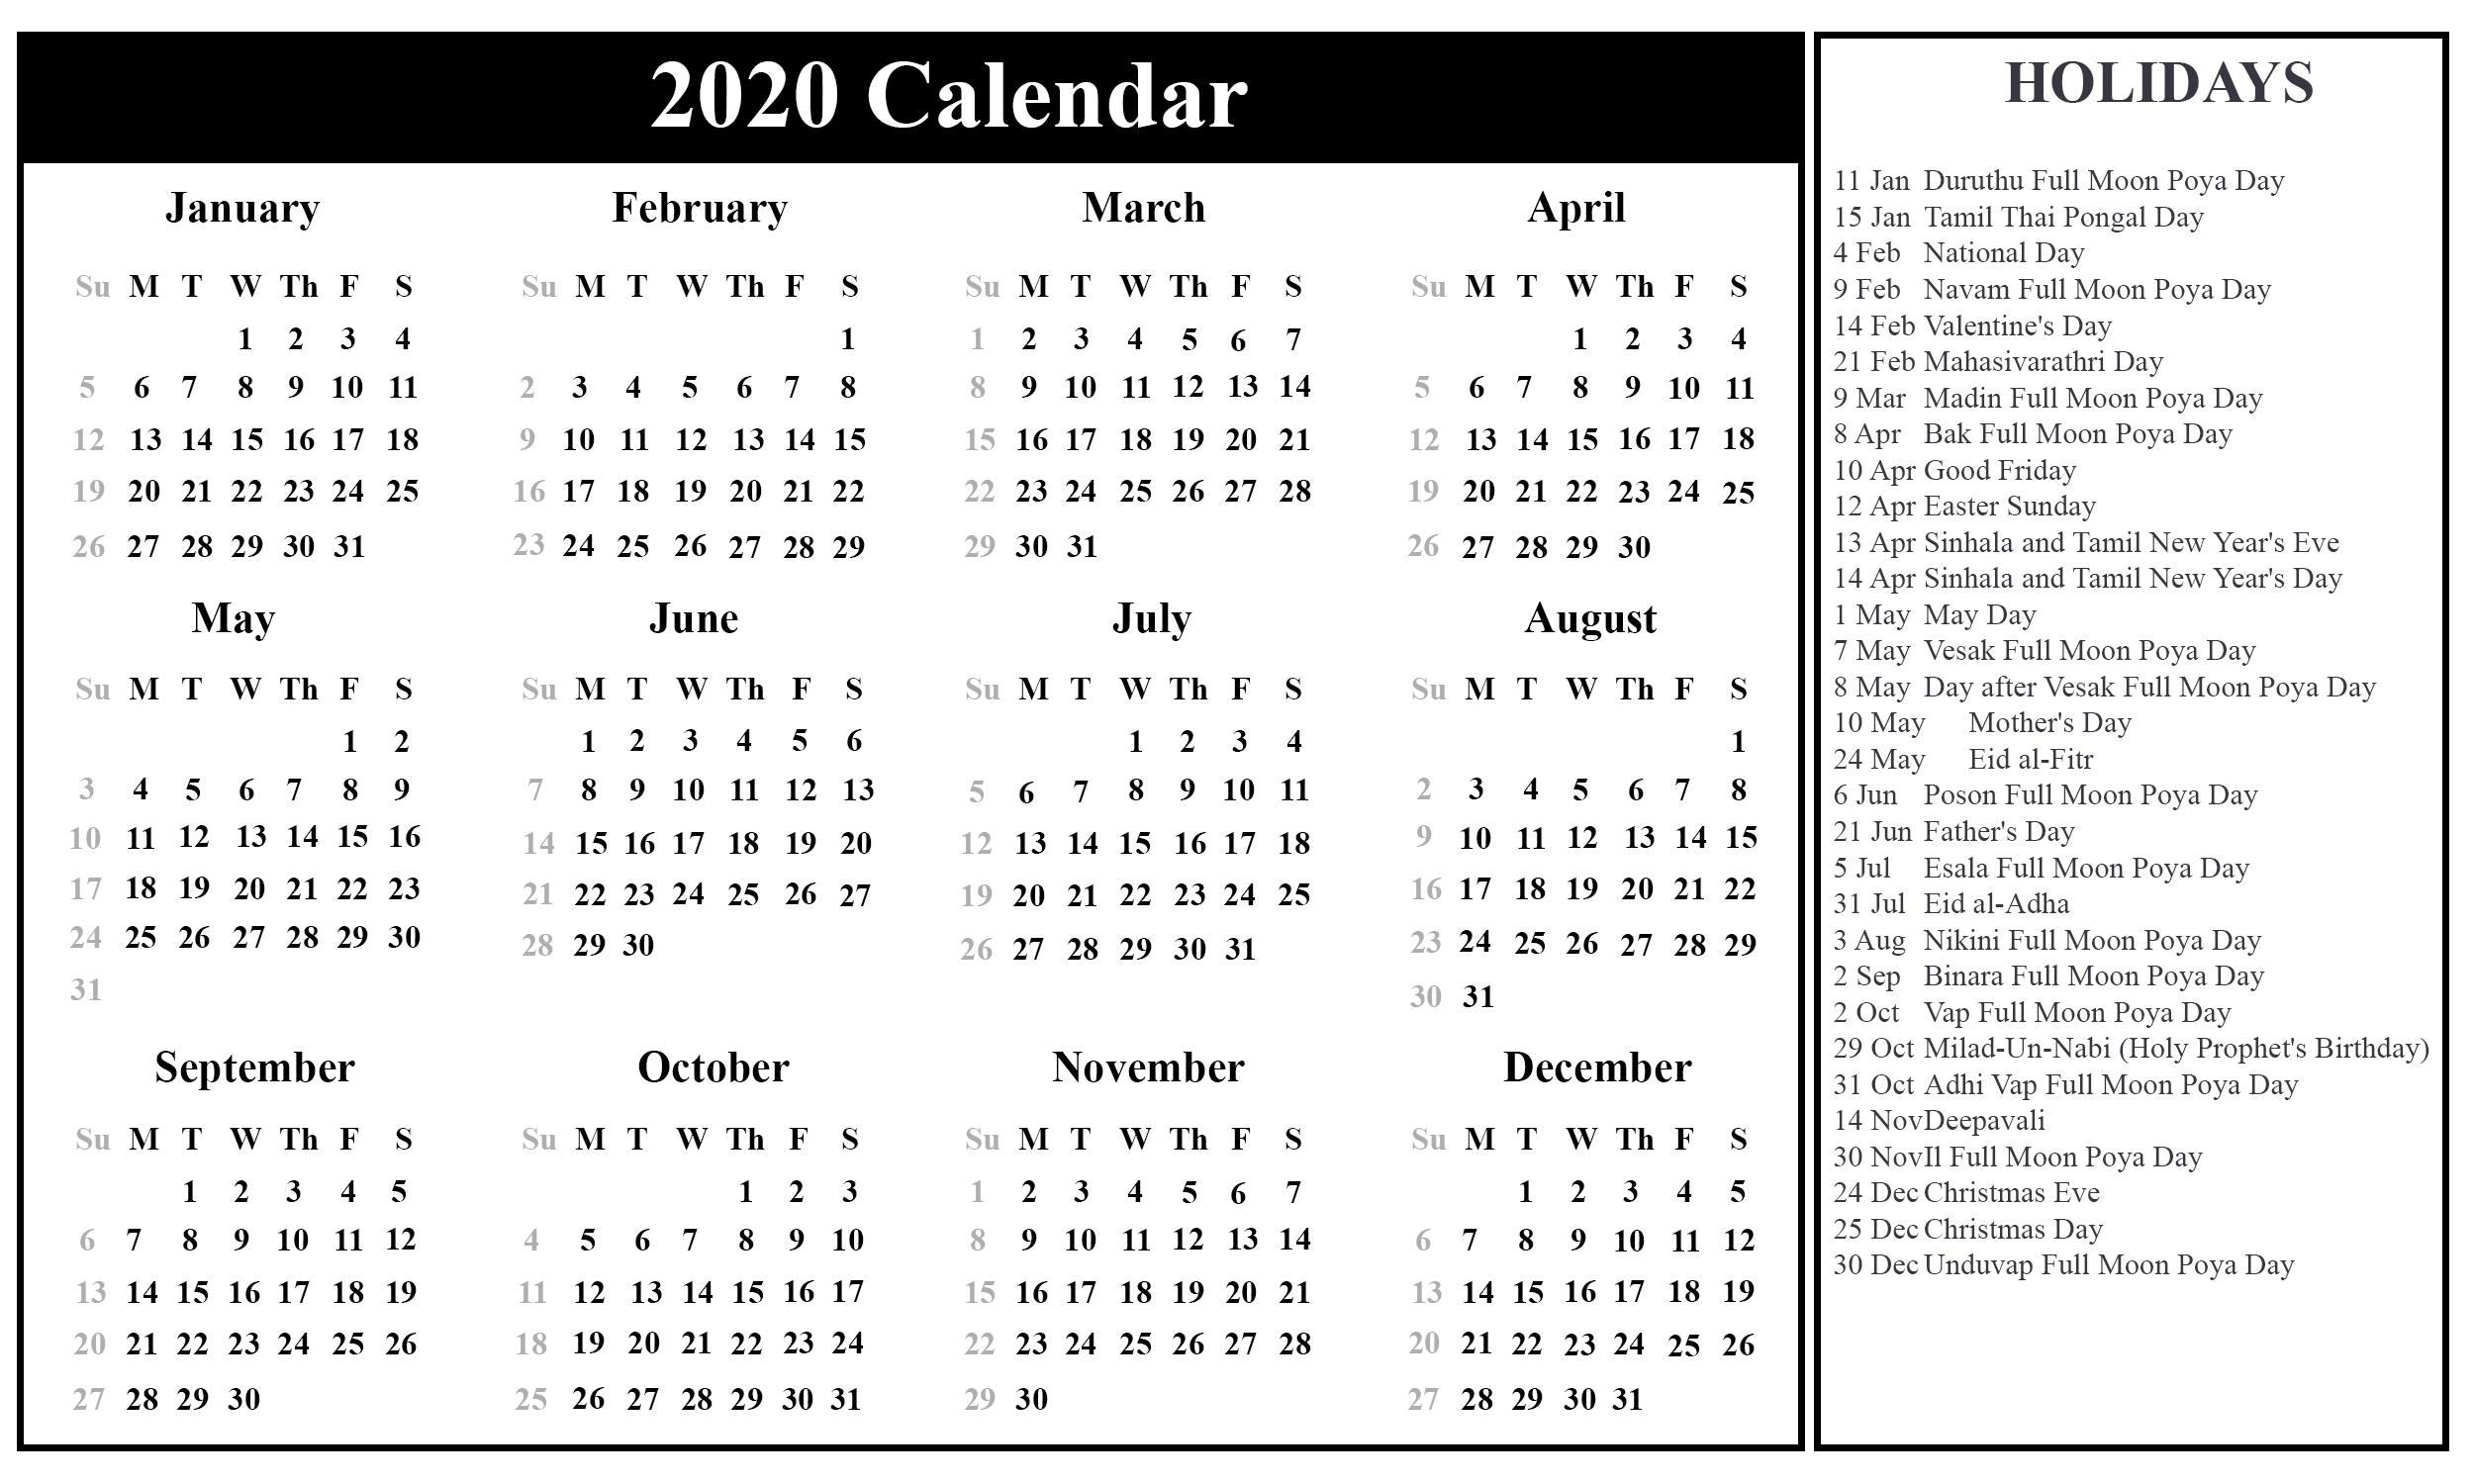 Free Printable Sri Lanka Calendar 2020 With Holidays In Pdf-2020 Holidays Printable List